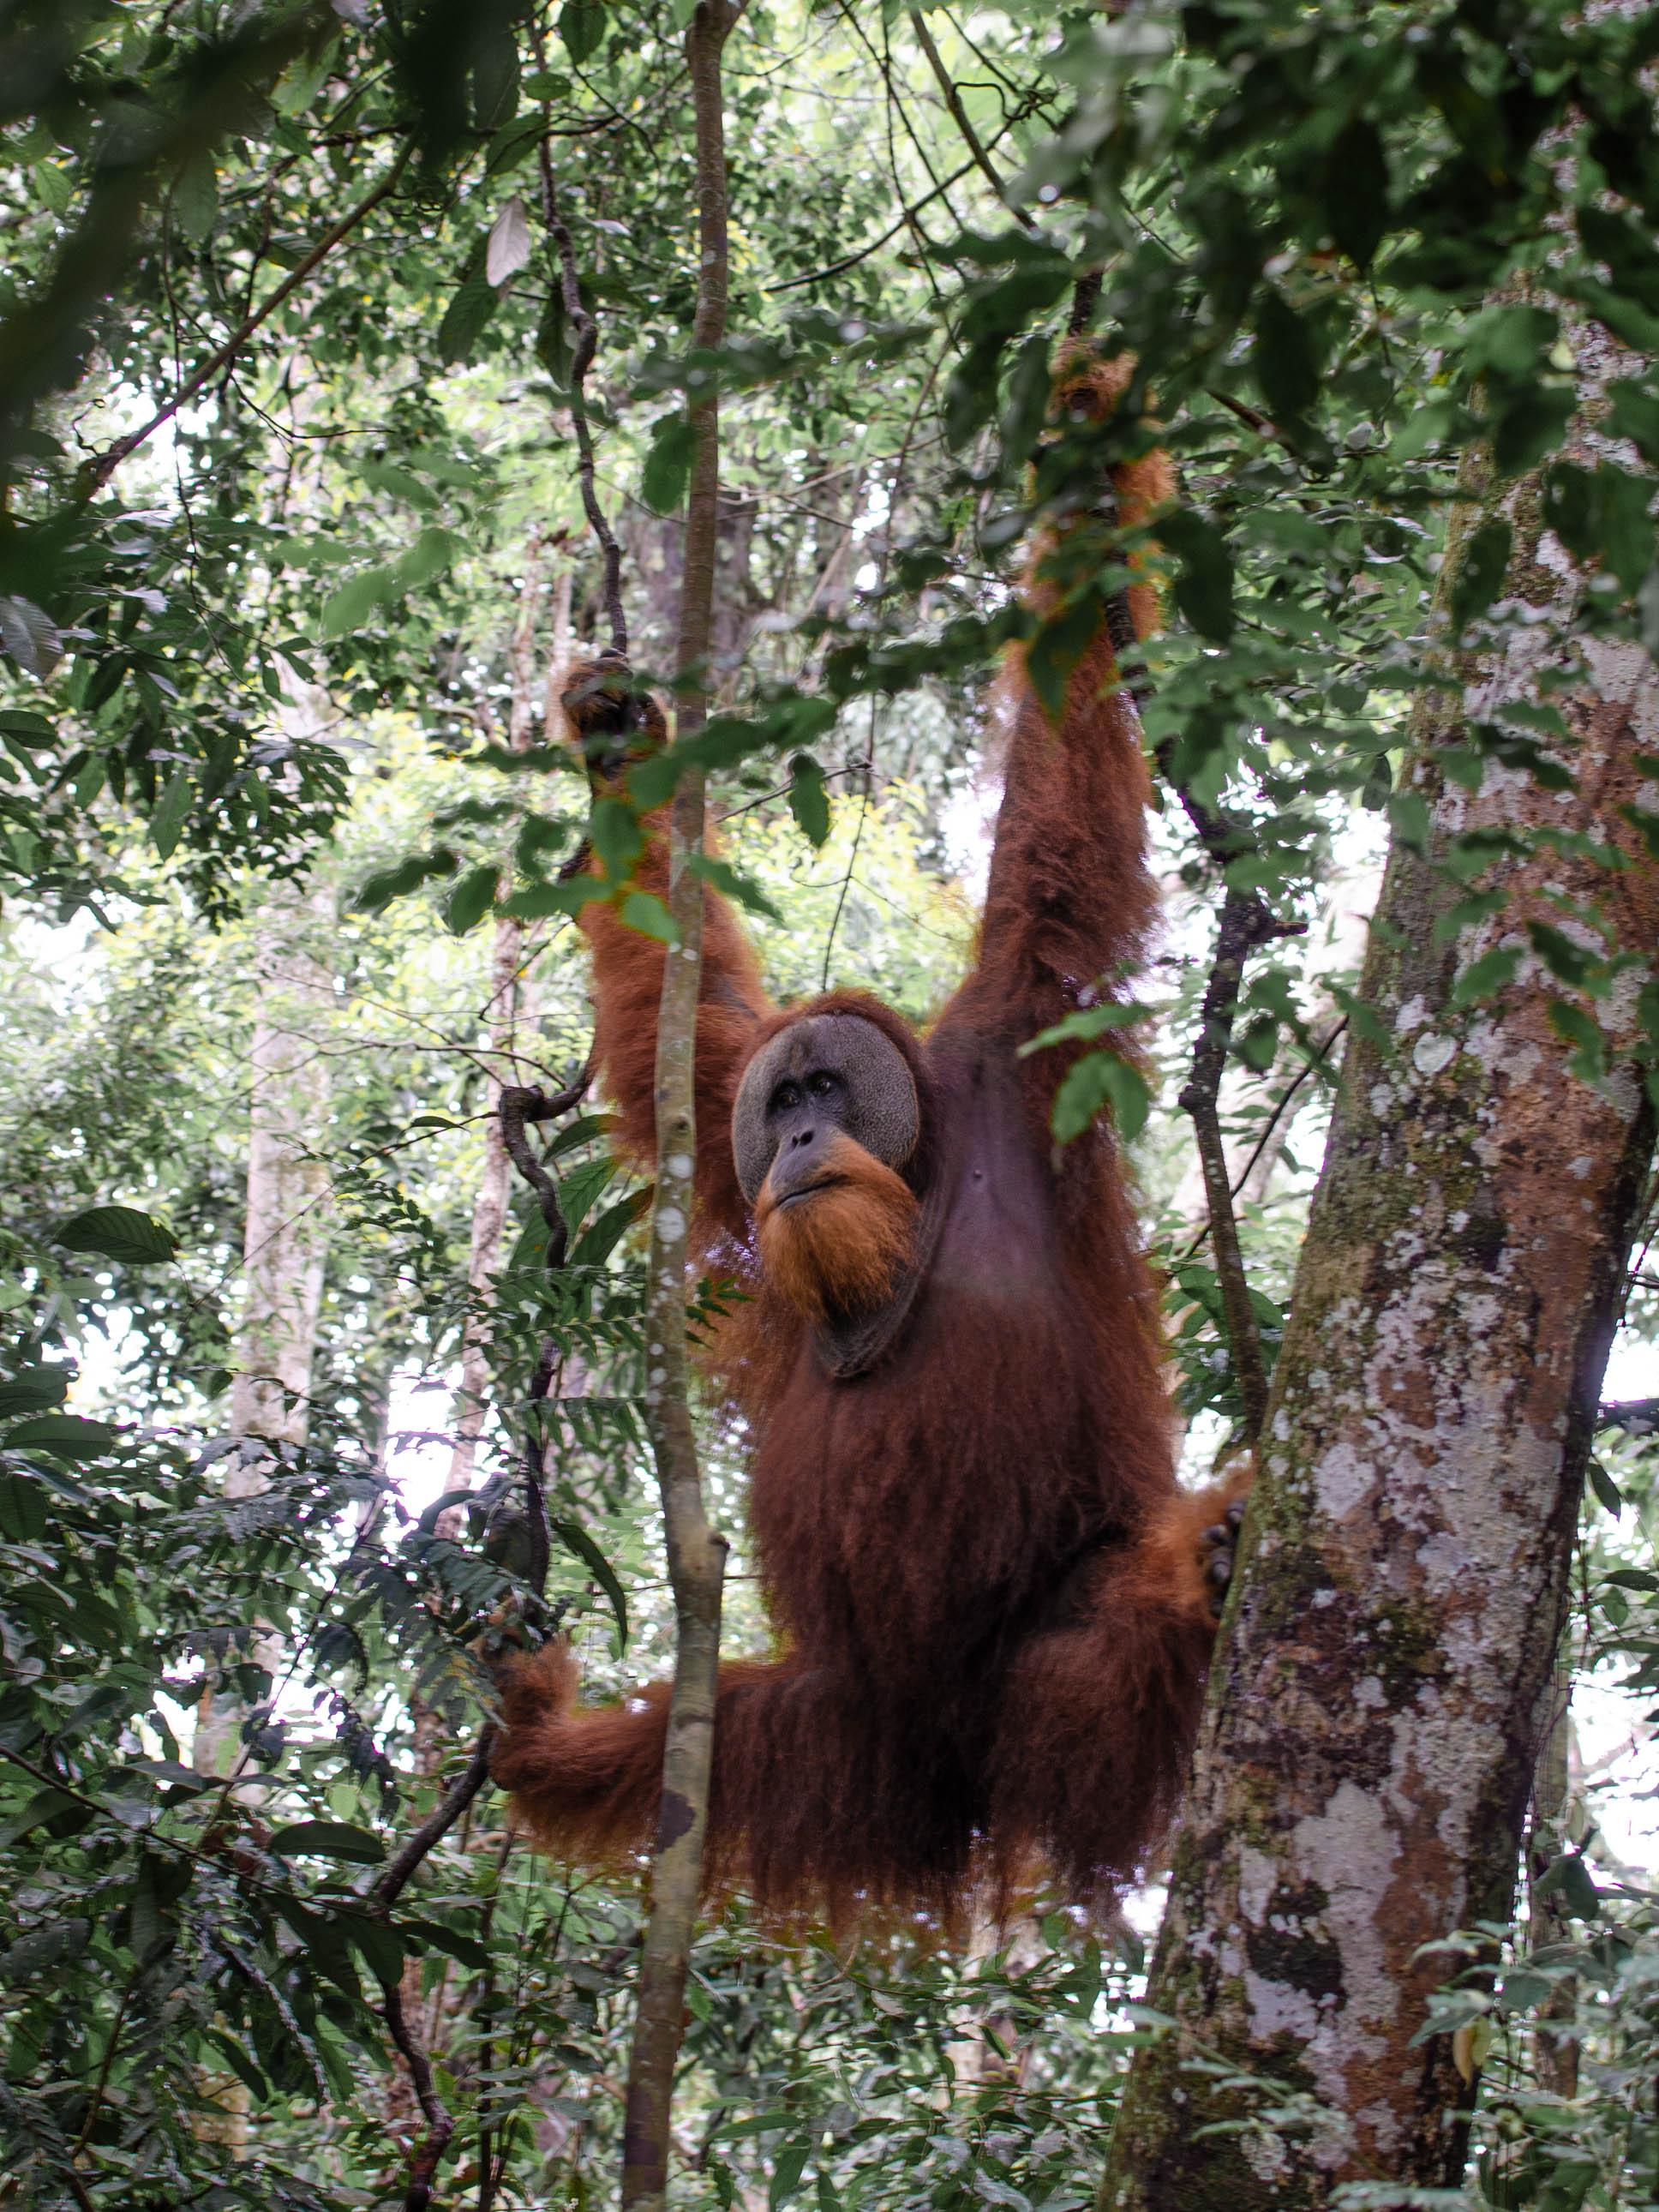 Orangutan Trekking in the Jungles of Sumatra